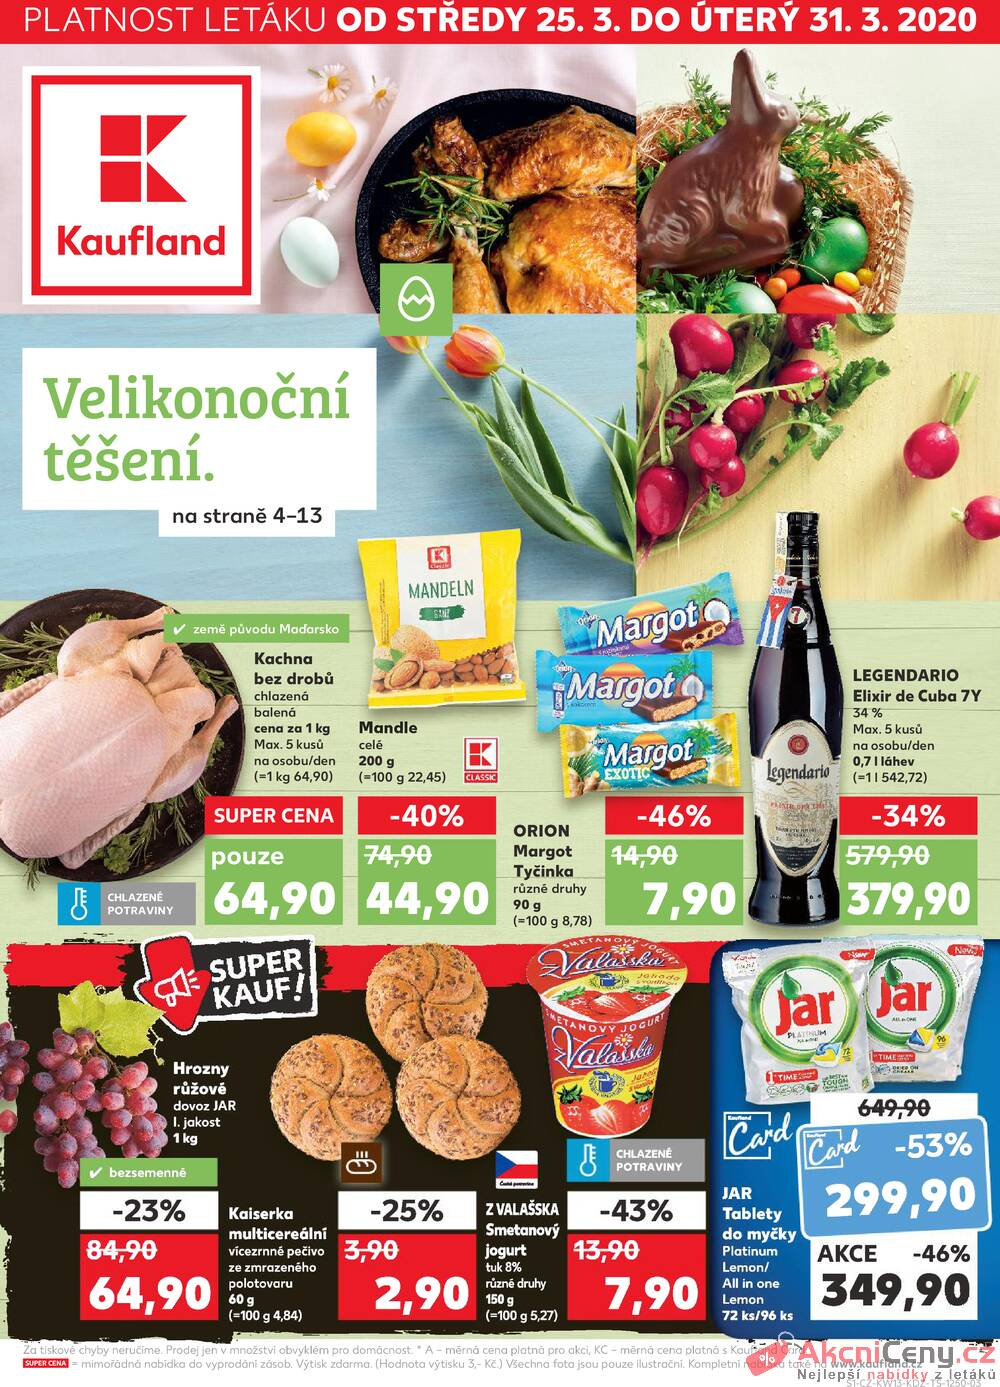 Leták Kaufland - Kaufland 25.3. - 31.3. - Kaufland - Ostrava - Zábřeh - strana 1